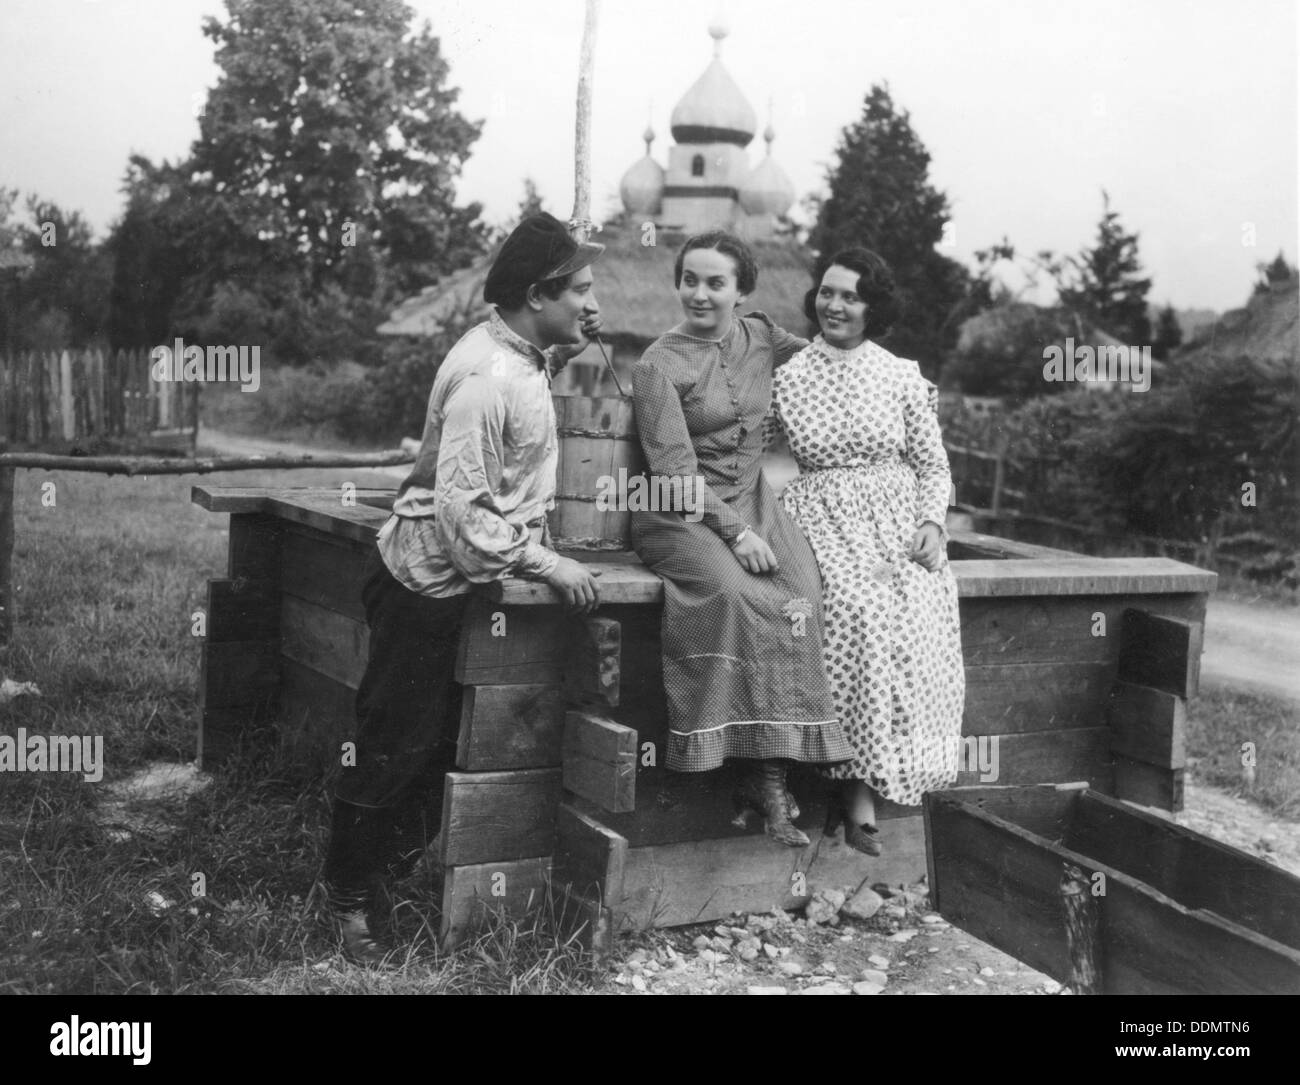 Scene from The Singing Blacksmith, 1936. - Stock Image